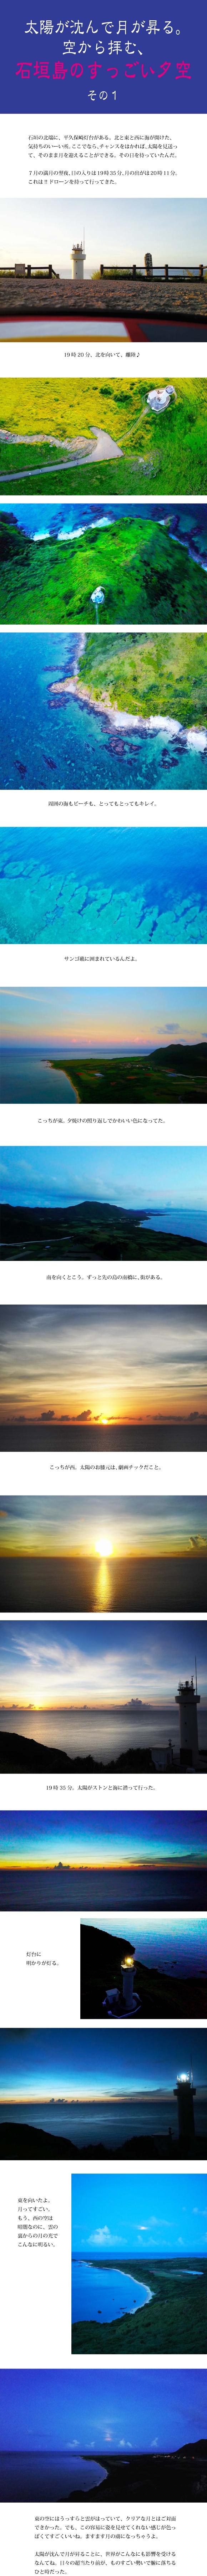 tomako170824.jpg